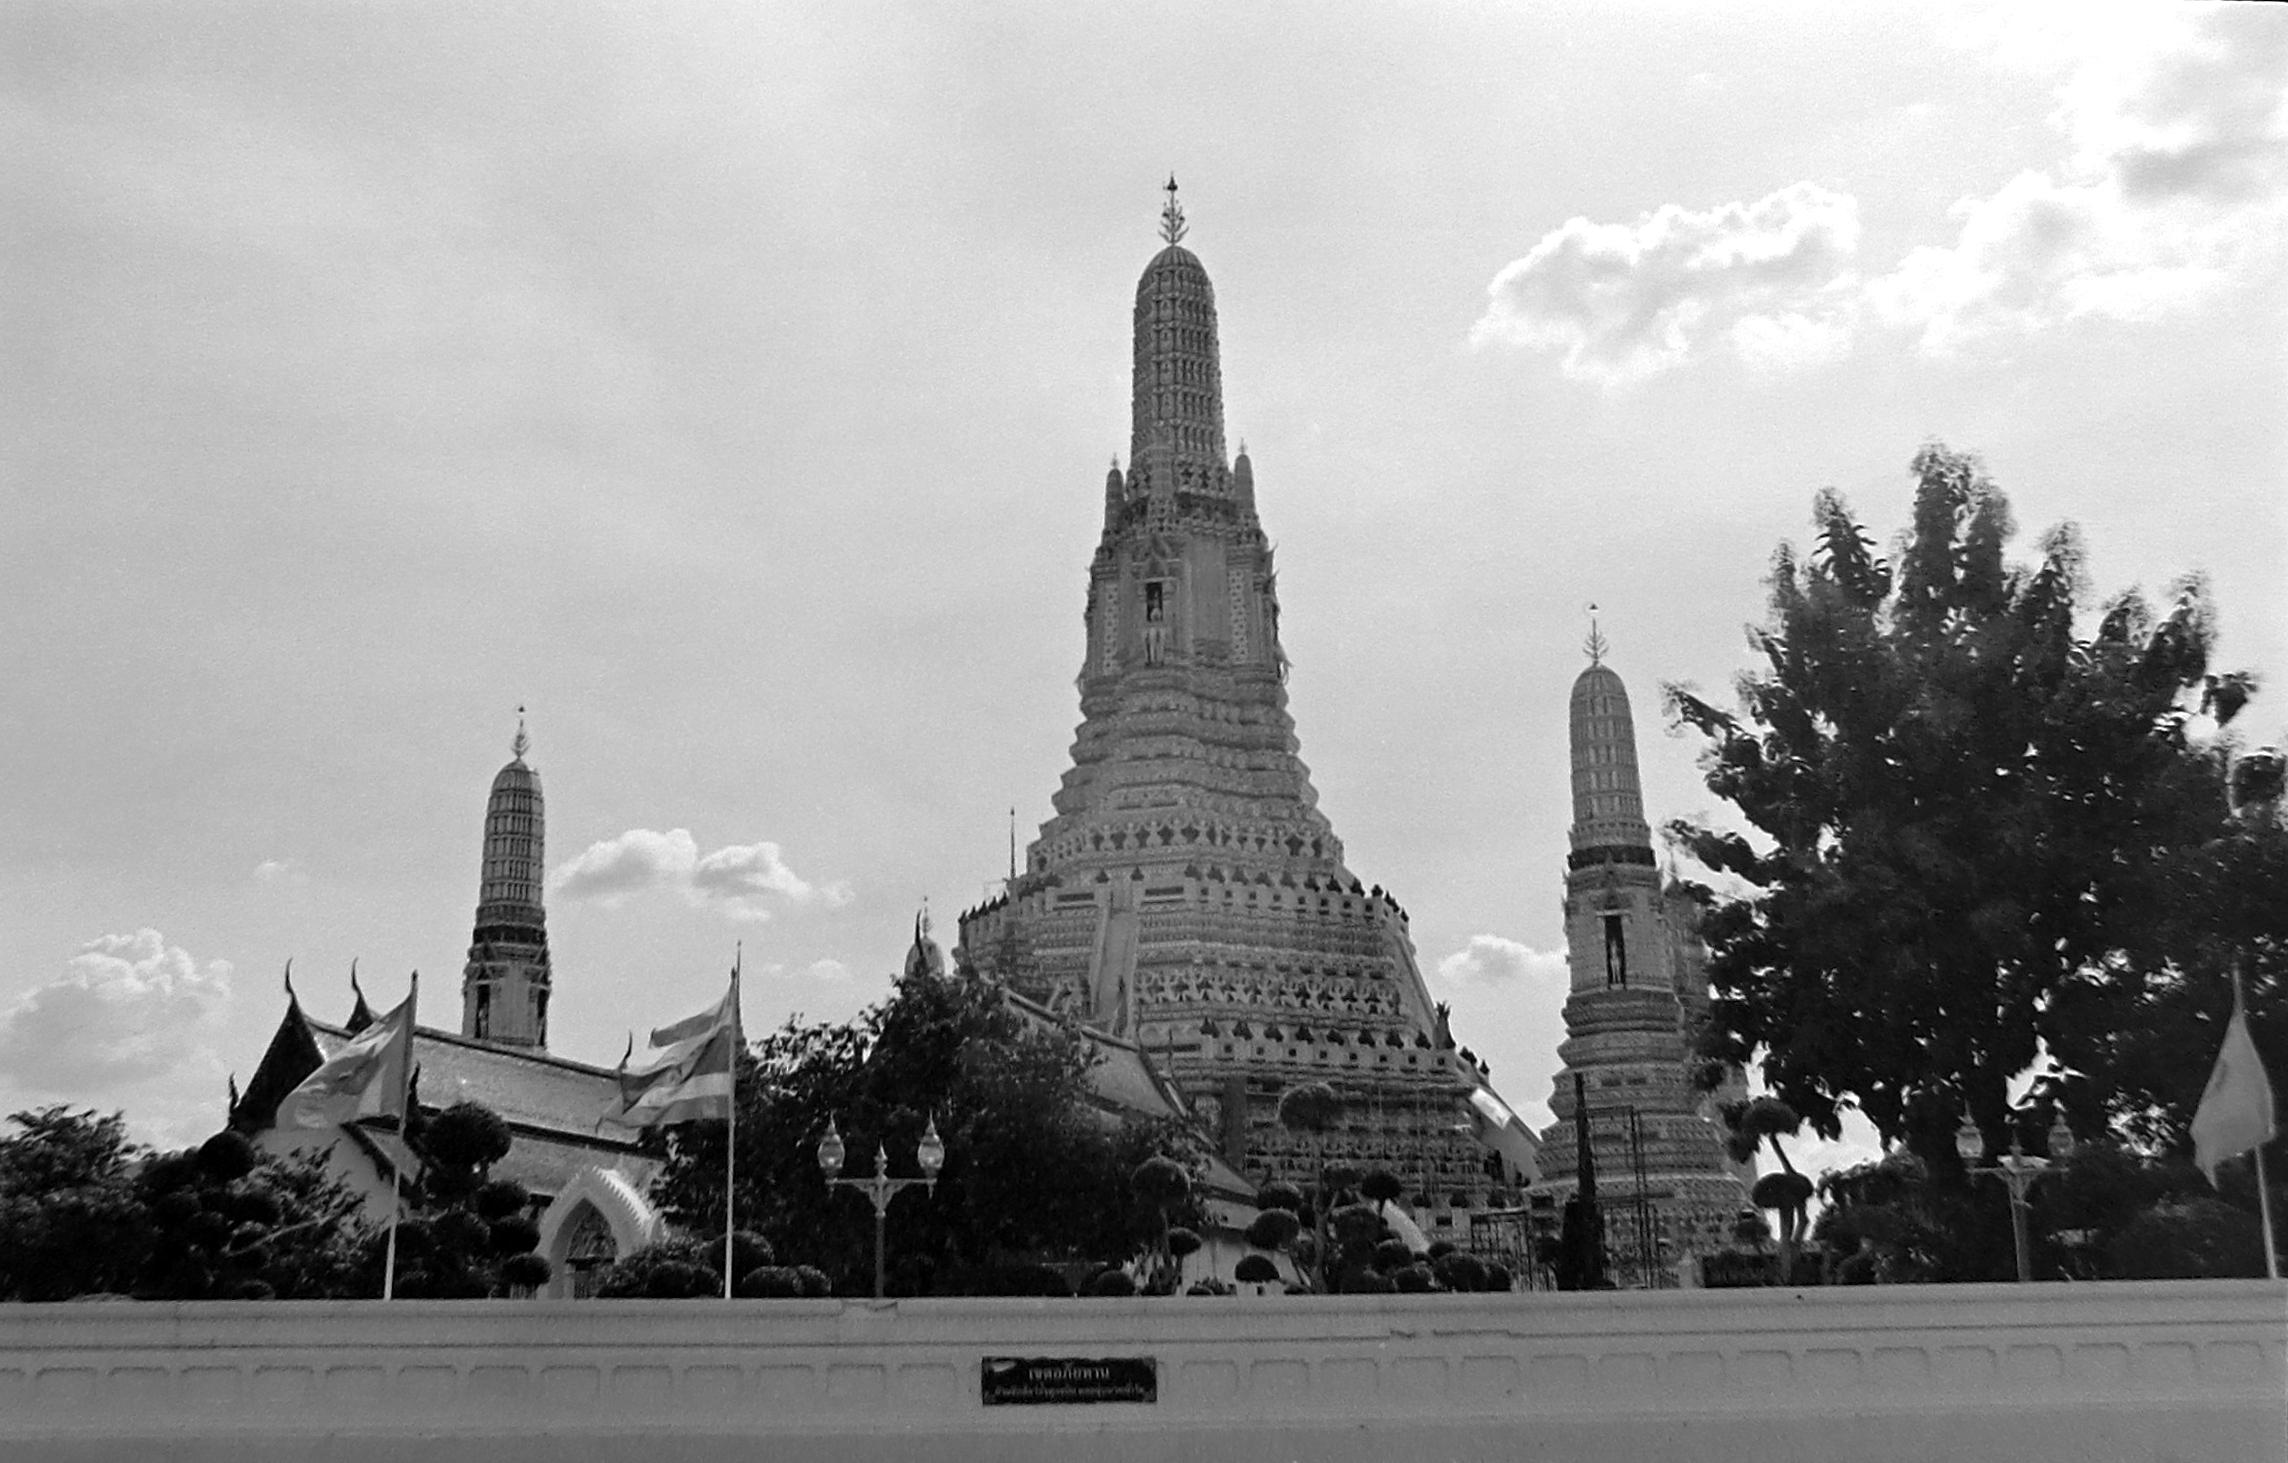 chromacomaphoto street photography bangkok thailand tri x 400 nikon f2 35mm ais Wat Arun Black and White.JPG